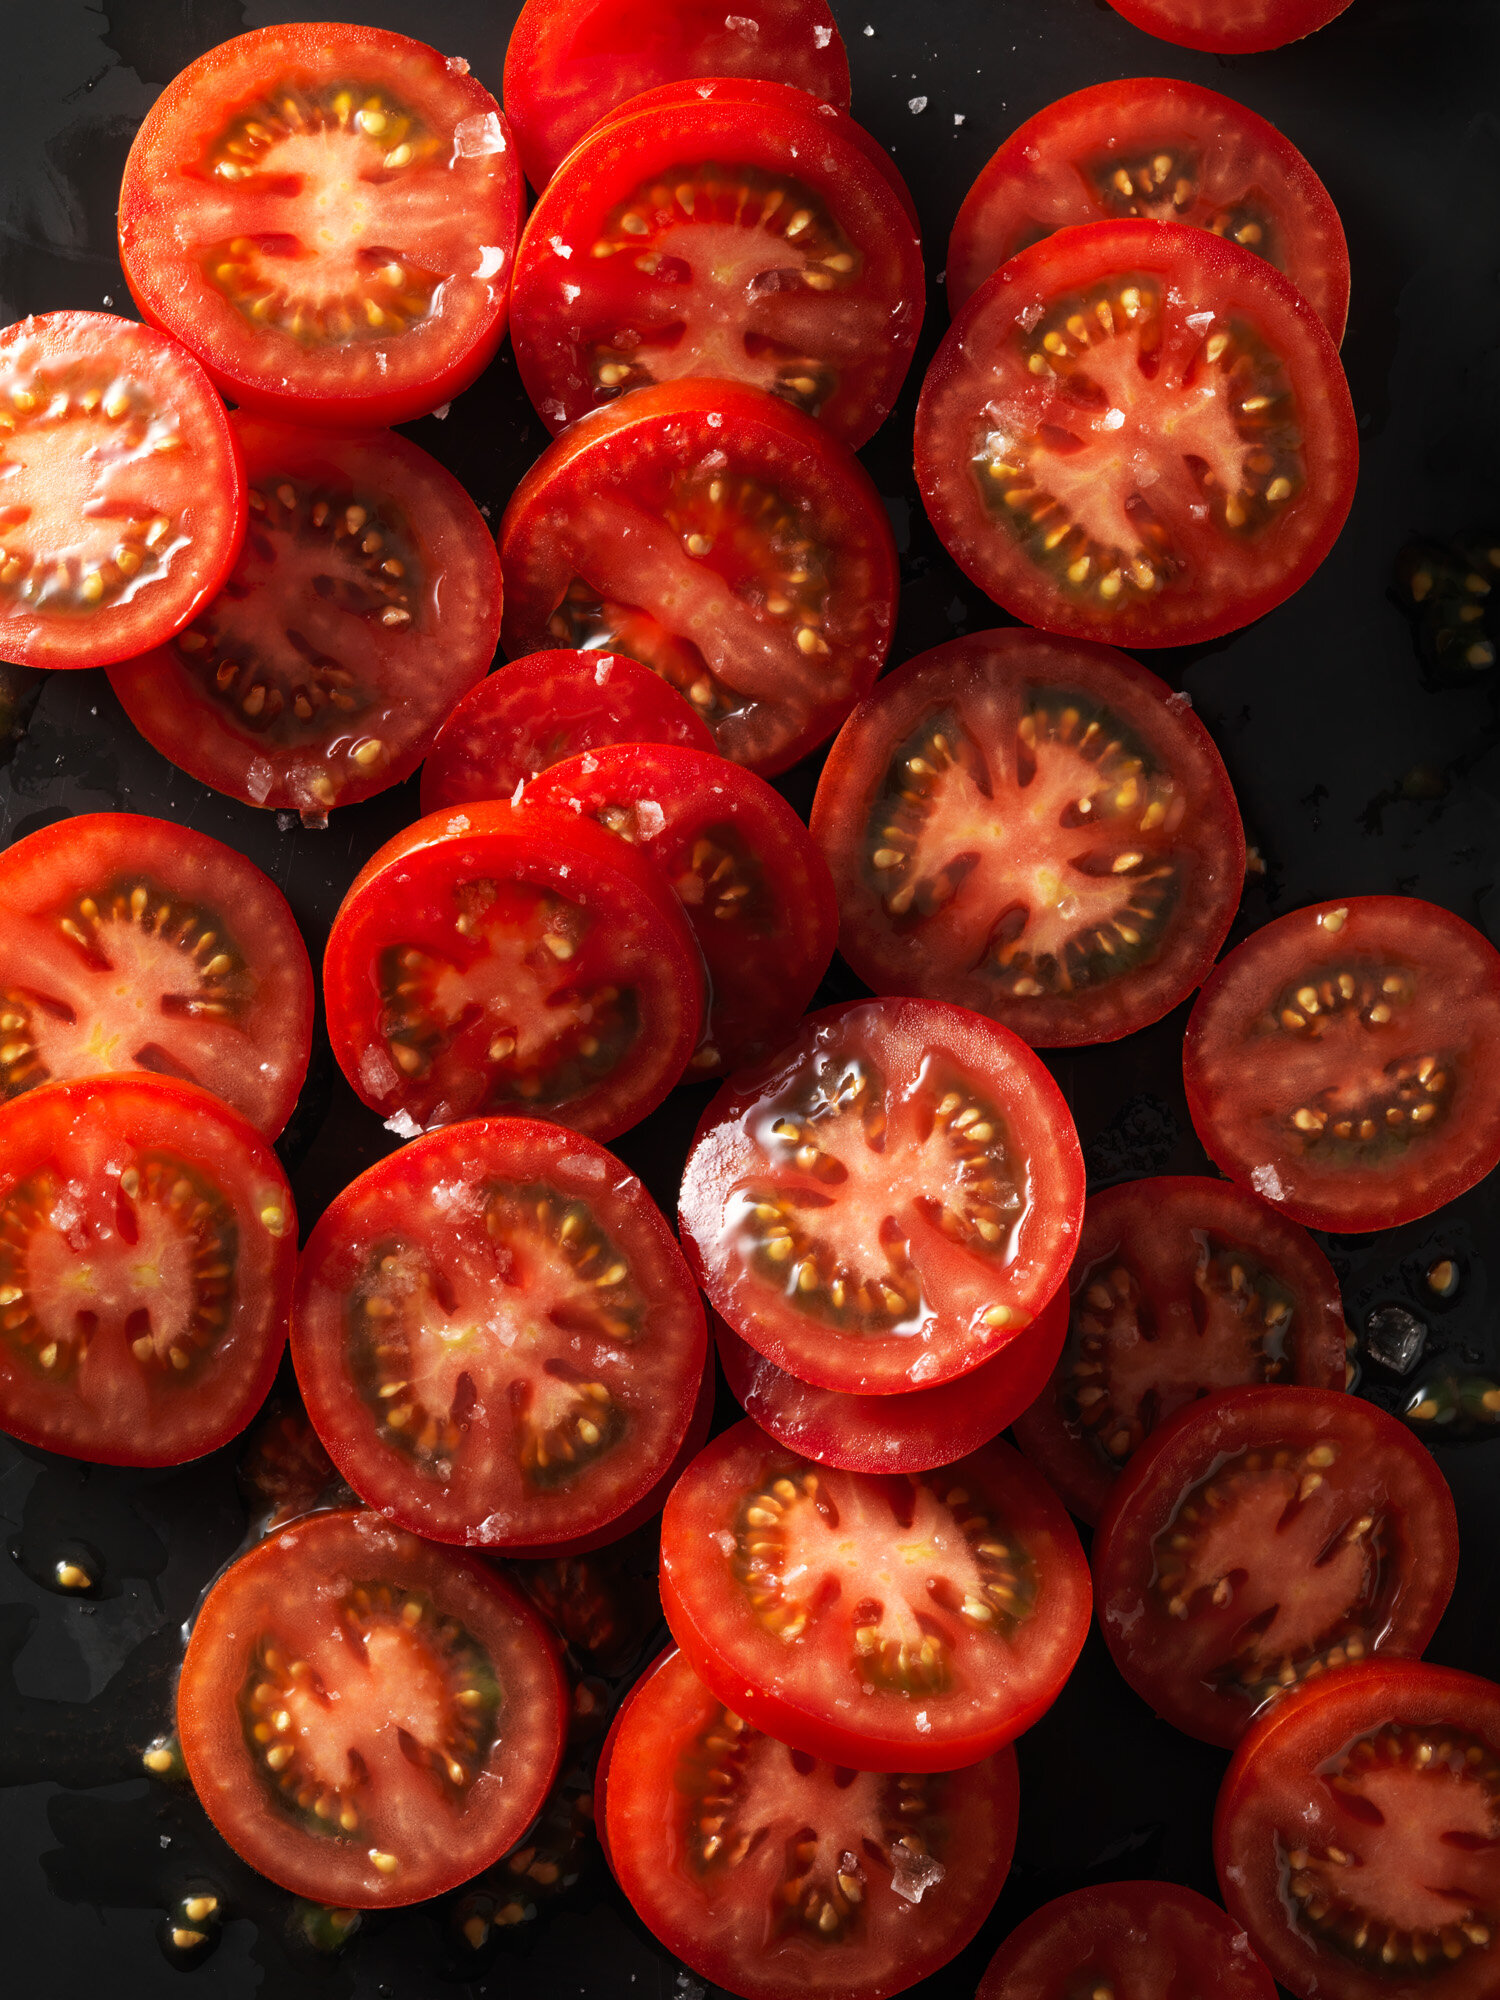 WaitroseFood_No1_29.7.19_Tomatoes_0067.jpg